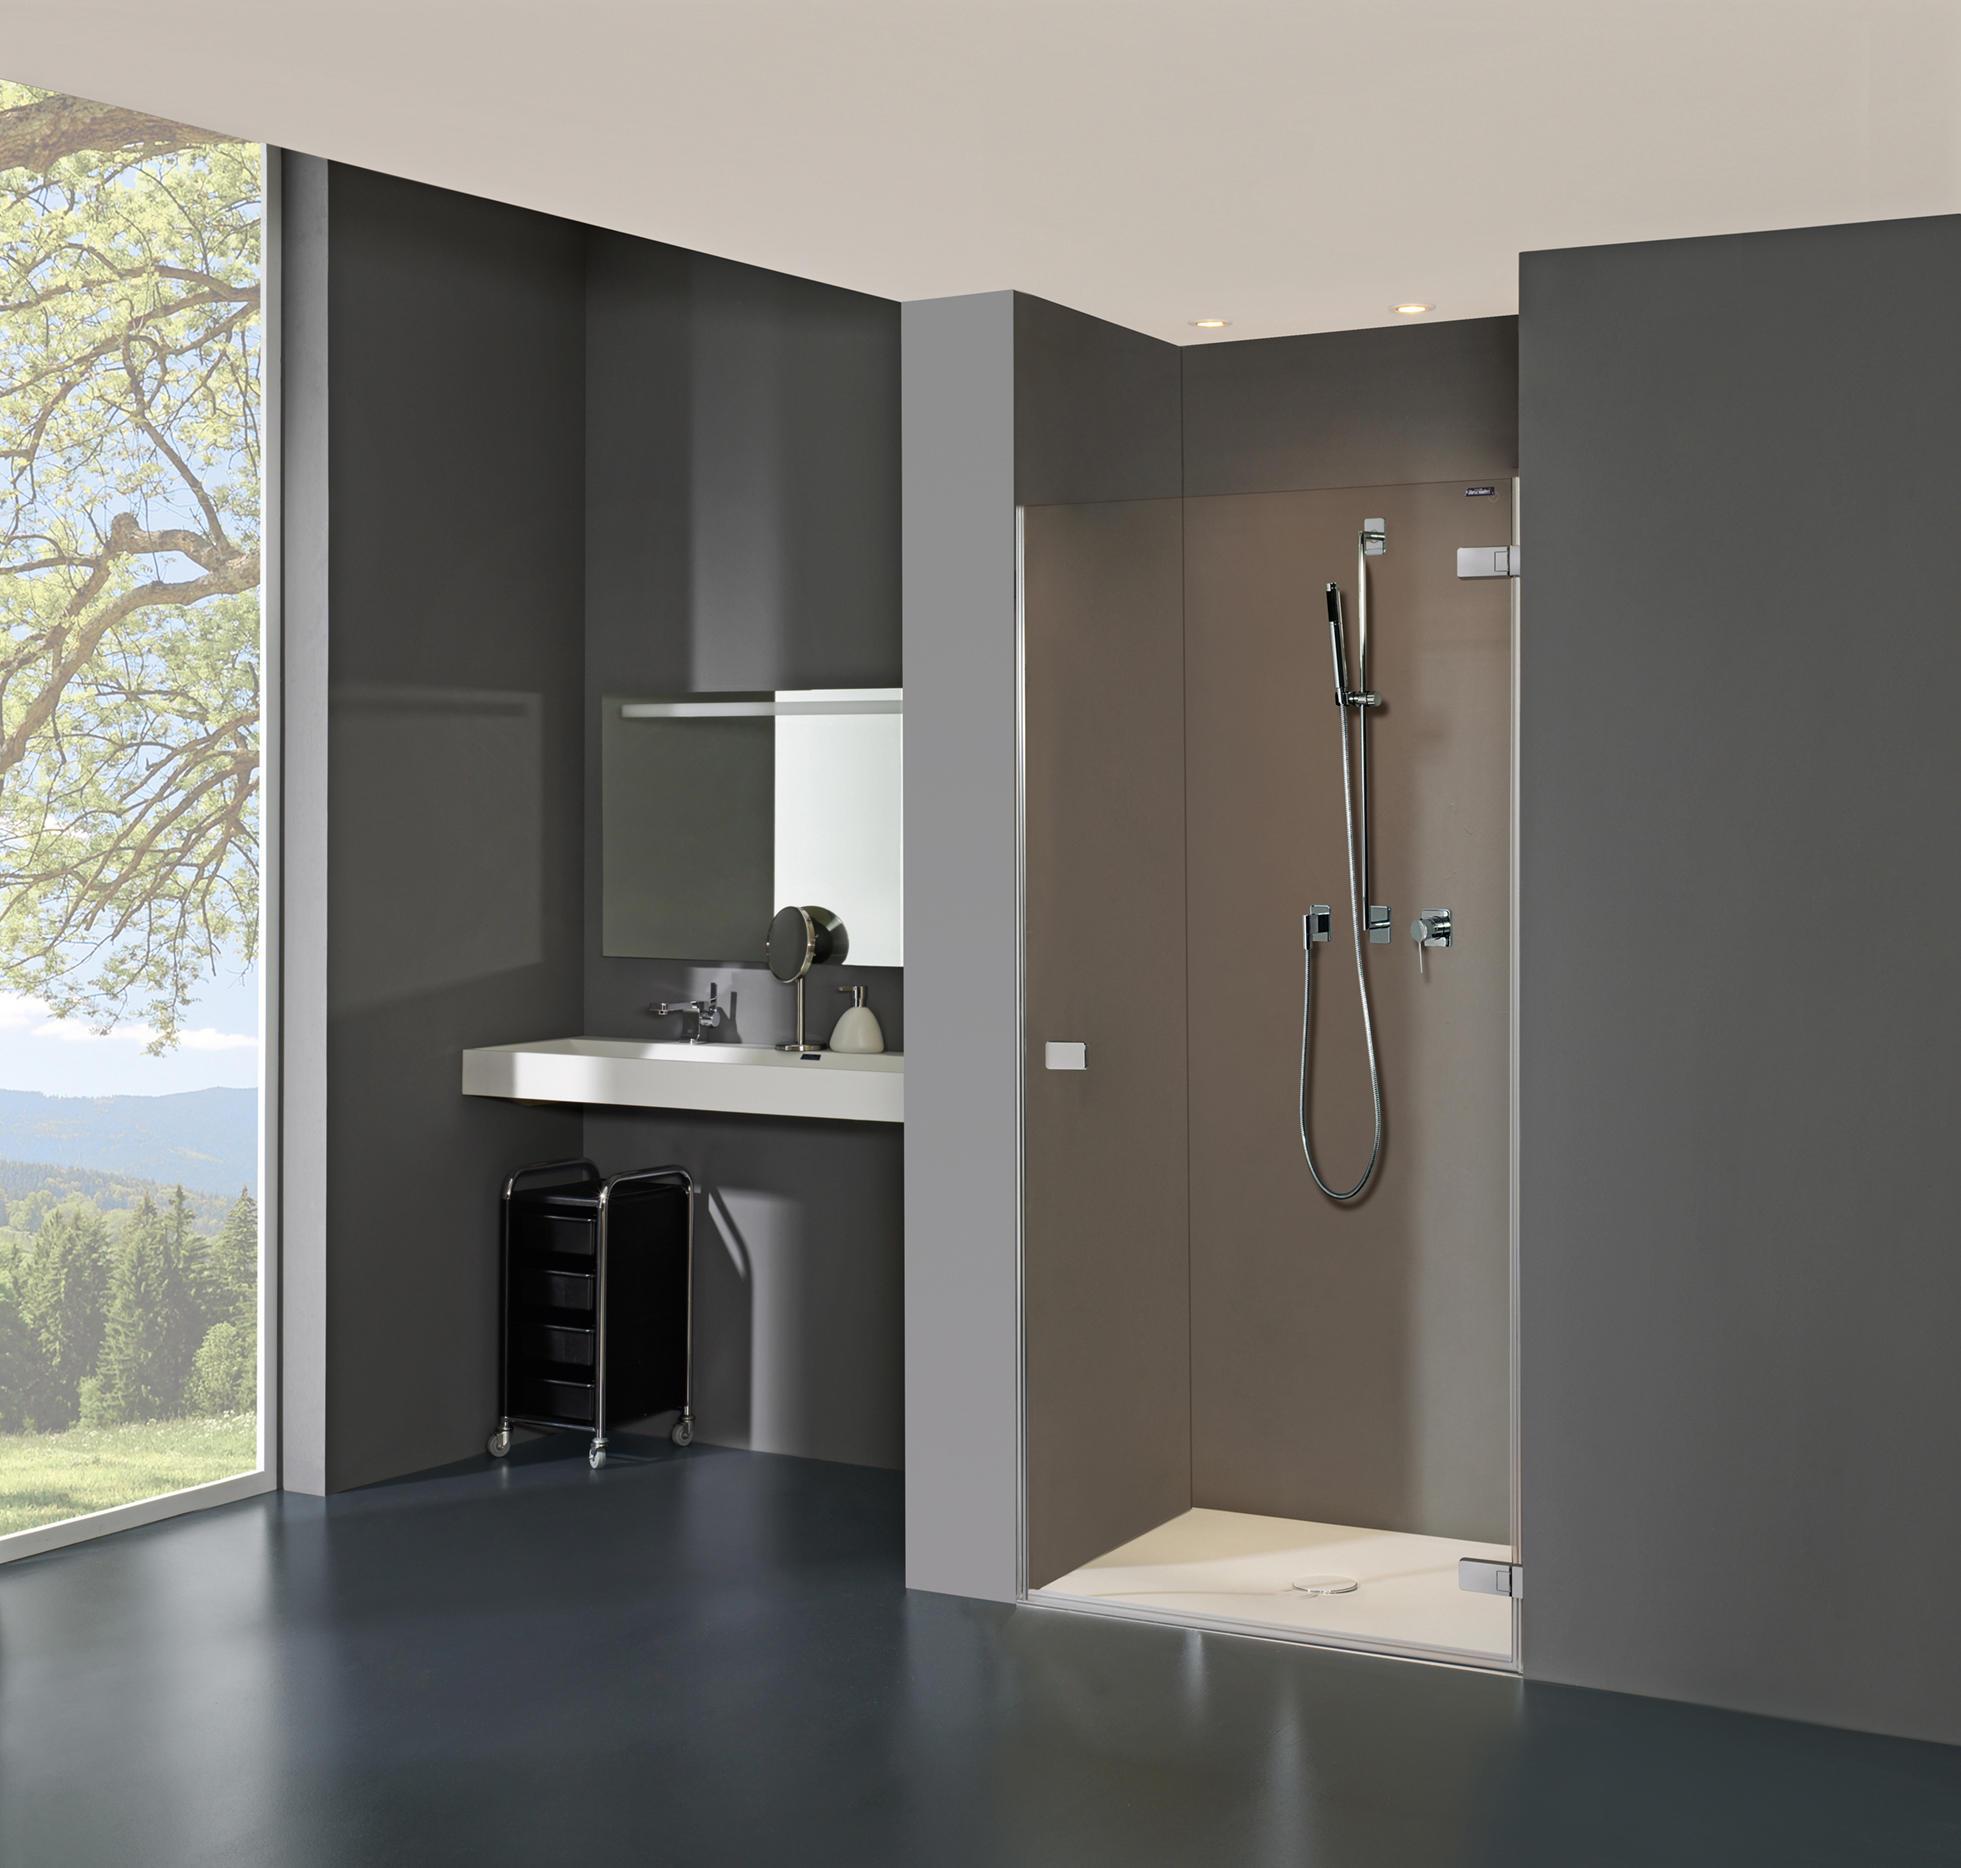 Duscholux Duschwand collection 3 plus - swing door in recess - shower screens from